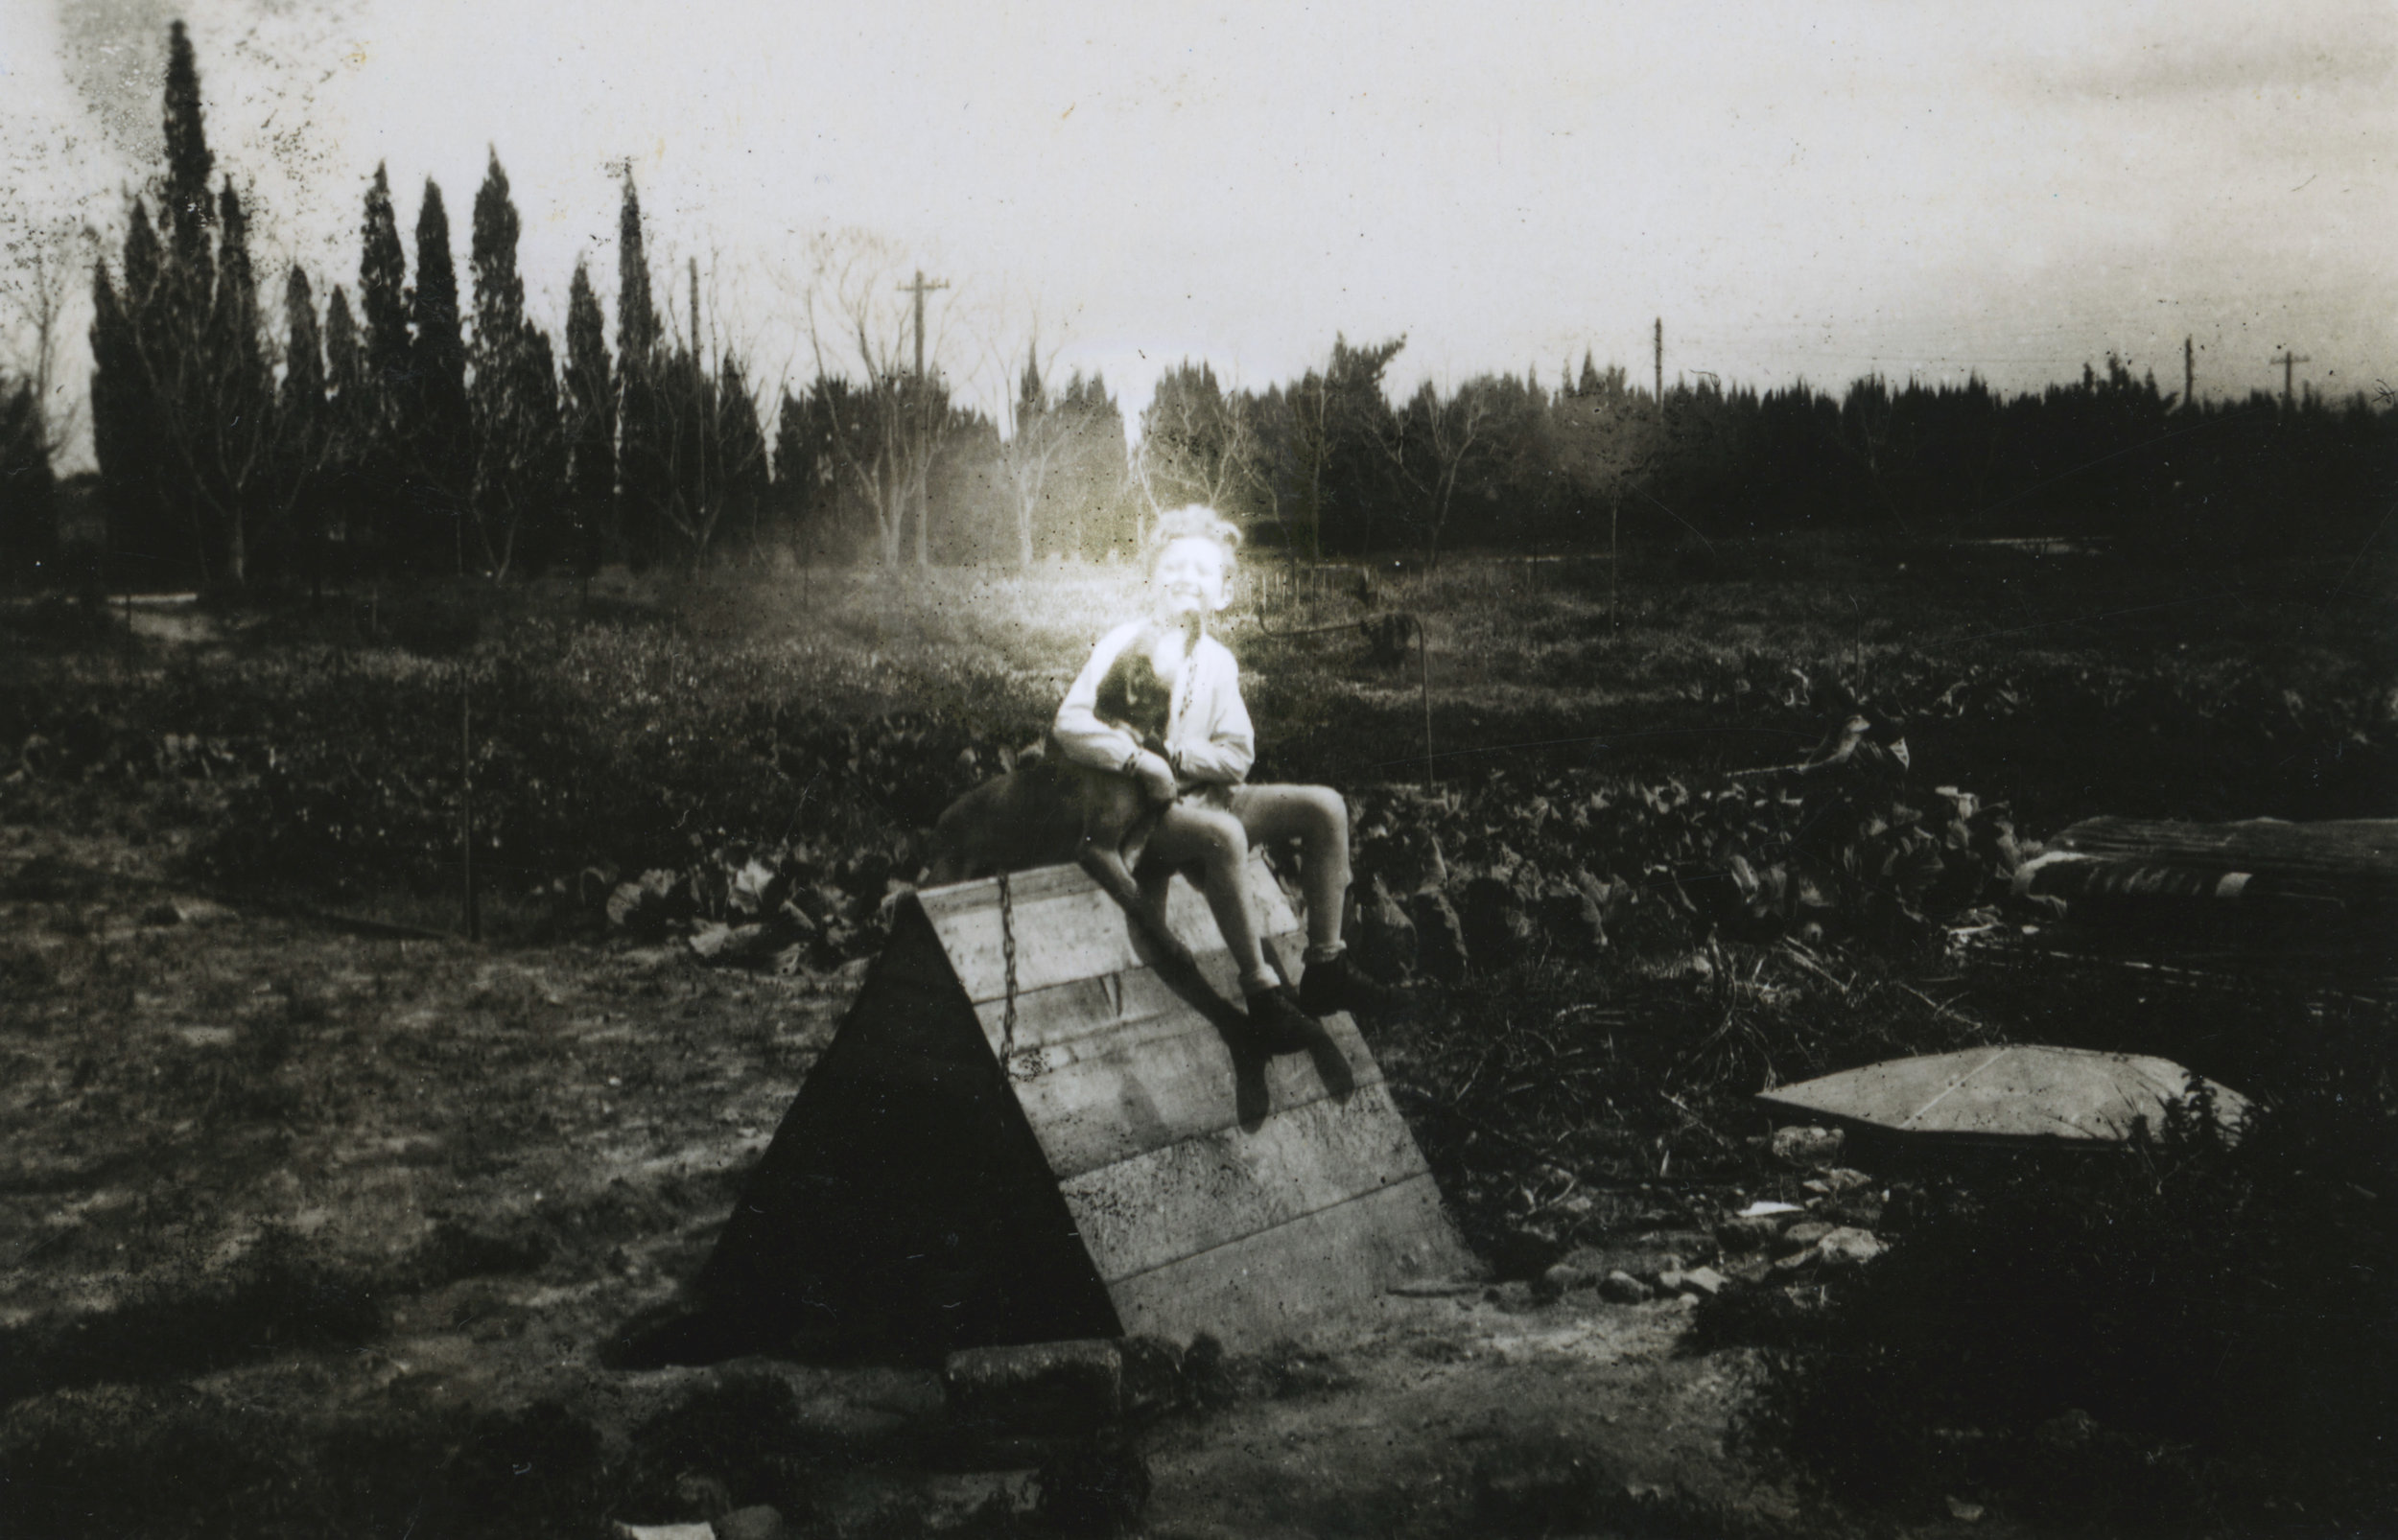 Untitled (Phantom series 3)